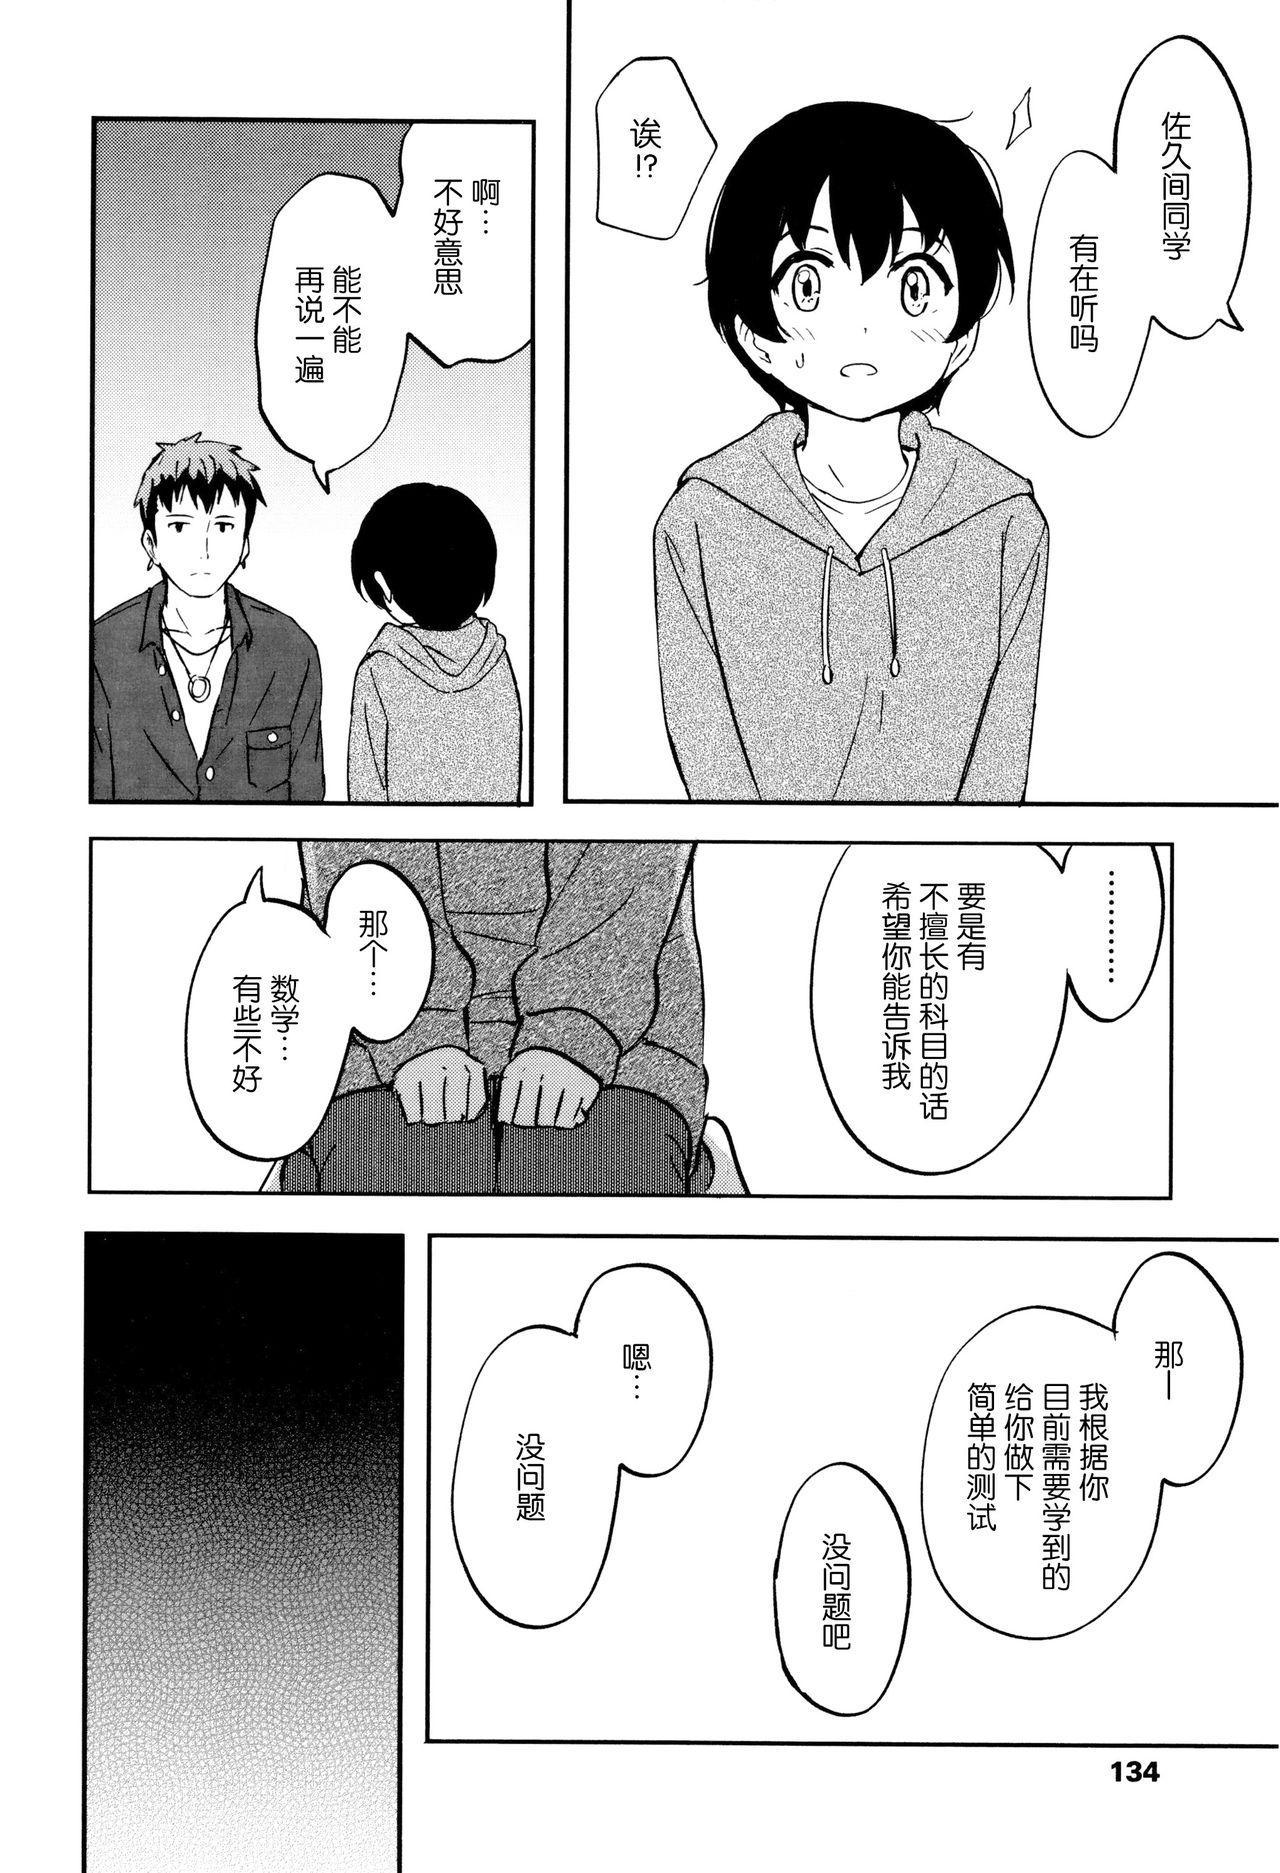 Tokubetsu na Mainichi - Special daily 136